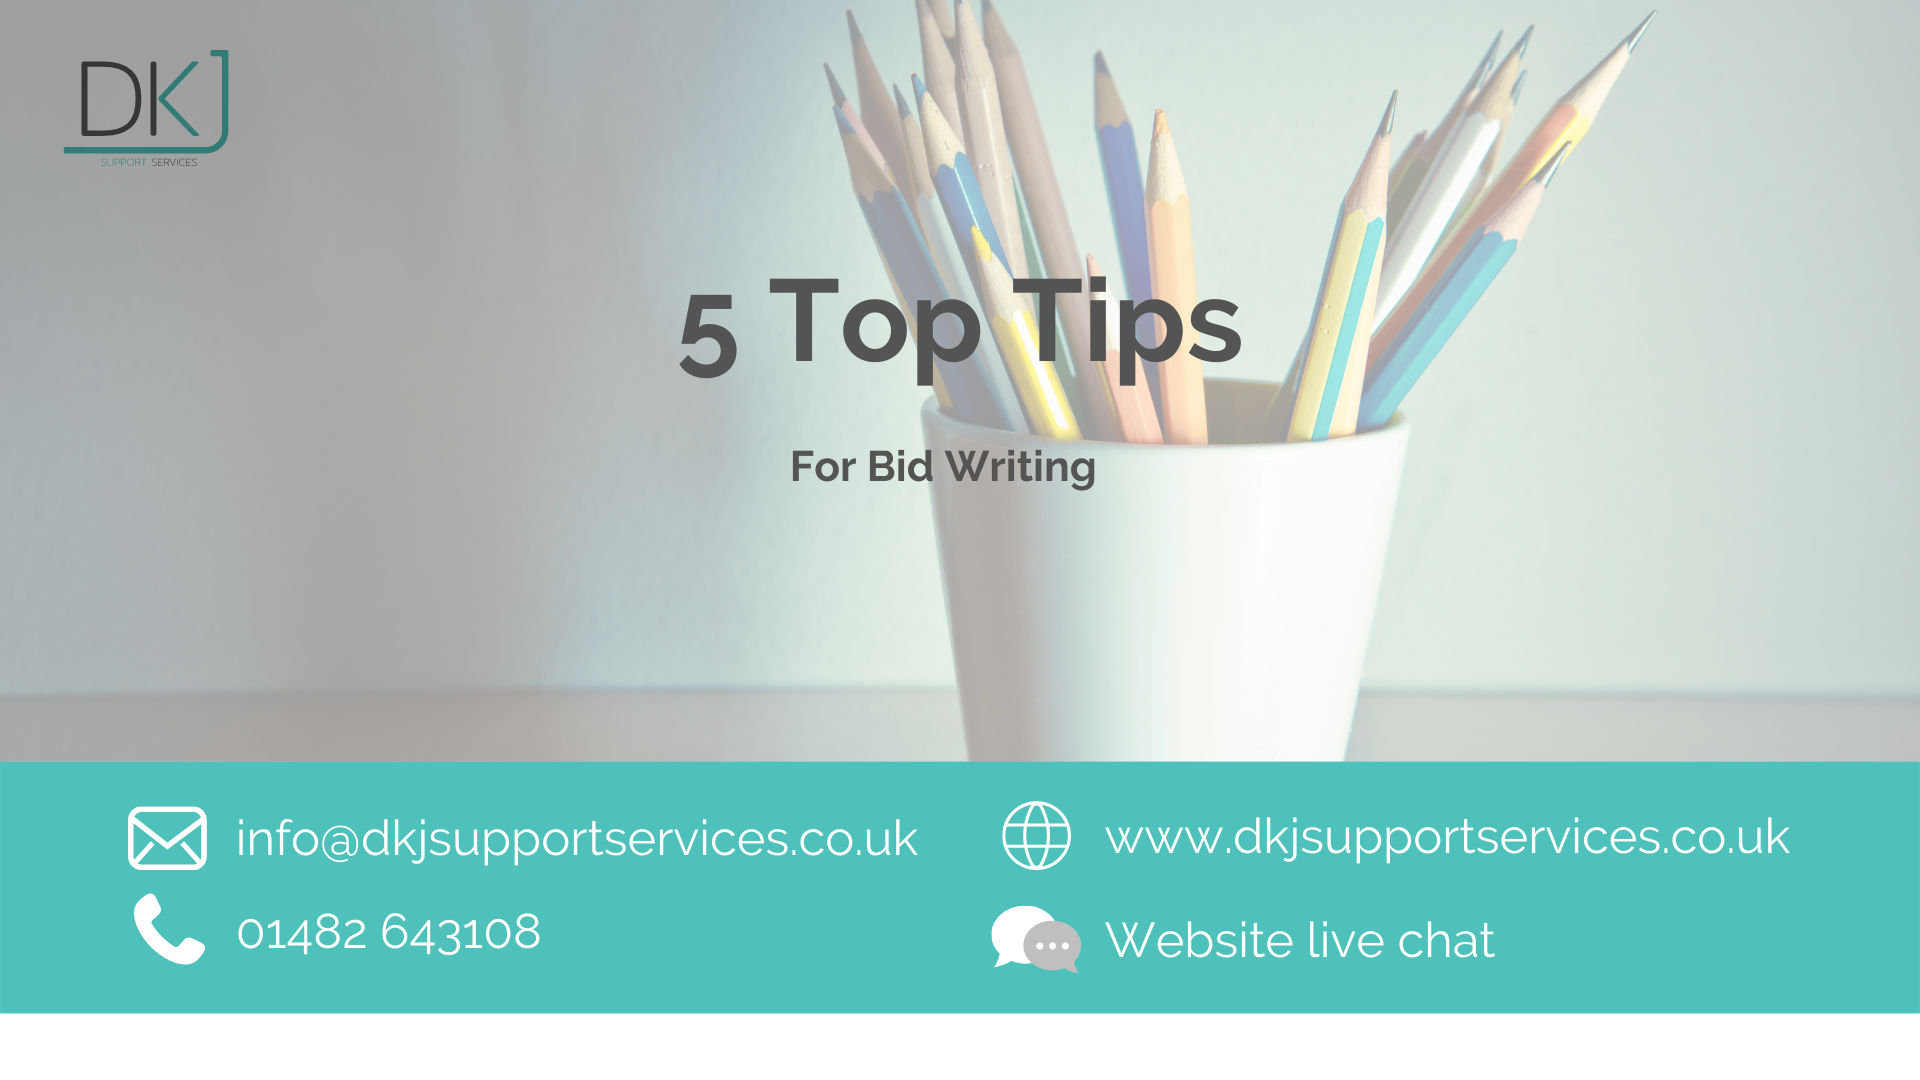 Top 5 Tips for Bid Writing